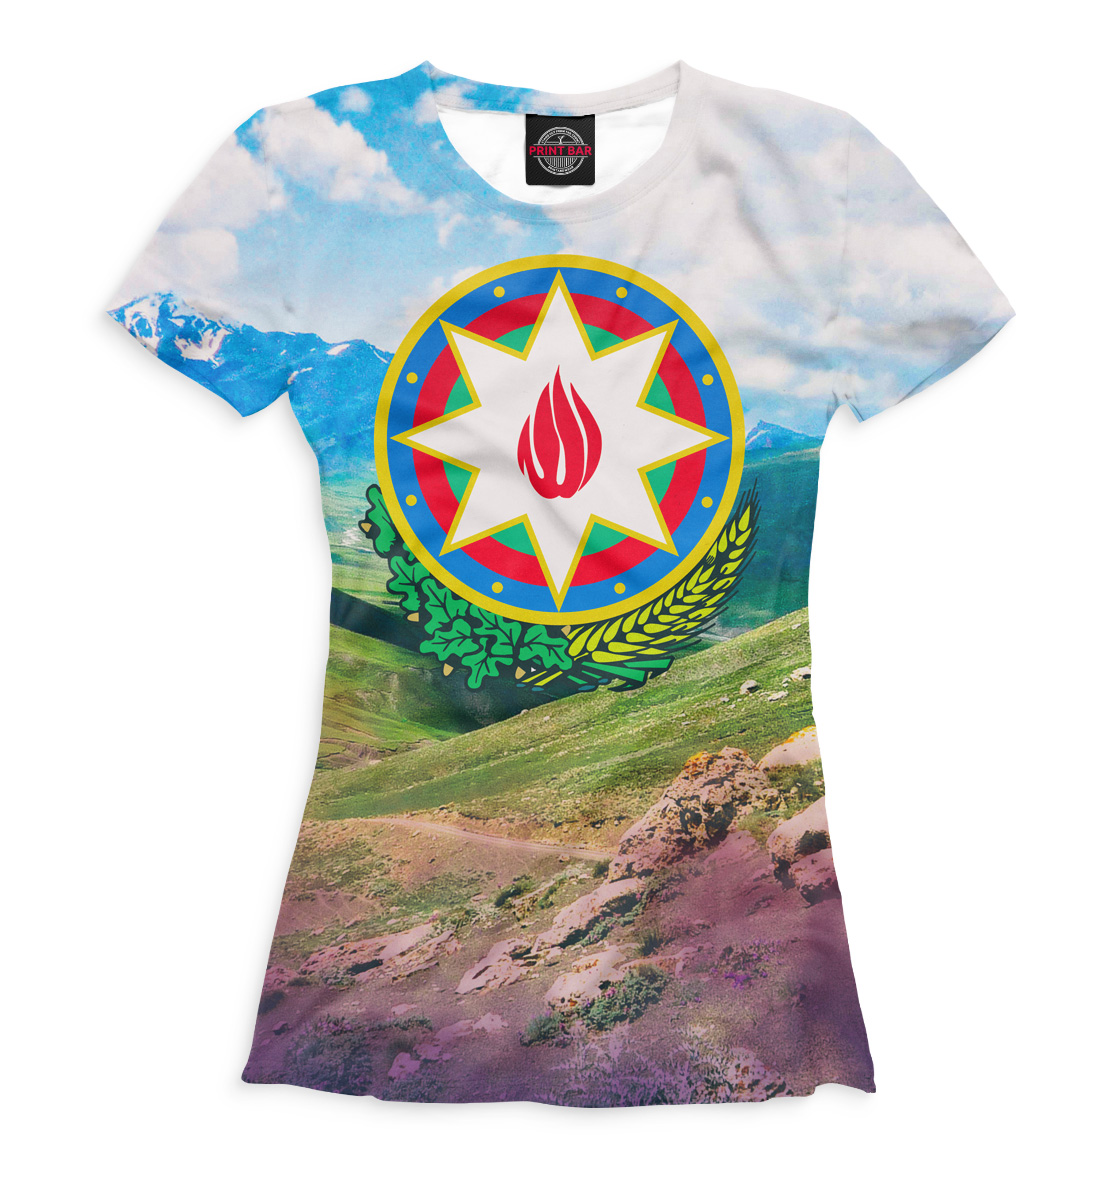 Купить Азербайджан, Printbar, Футболки, CTS-373708-fut-1